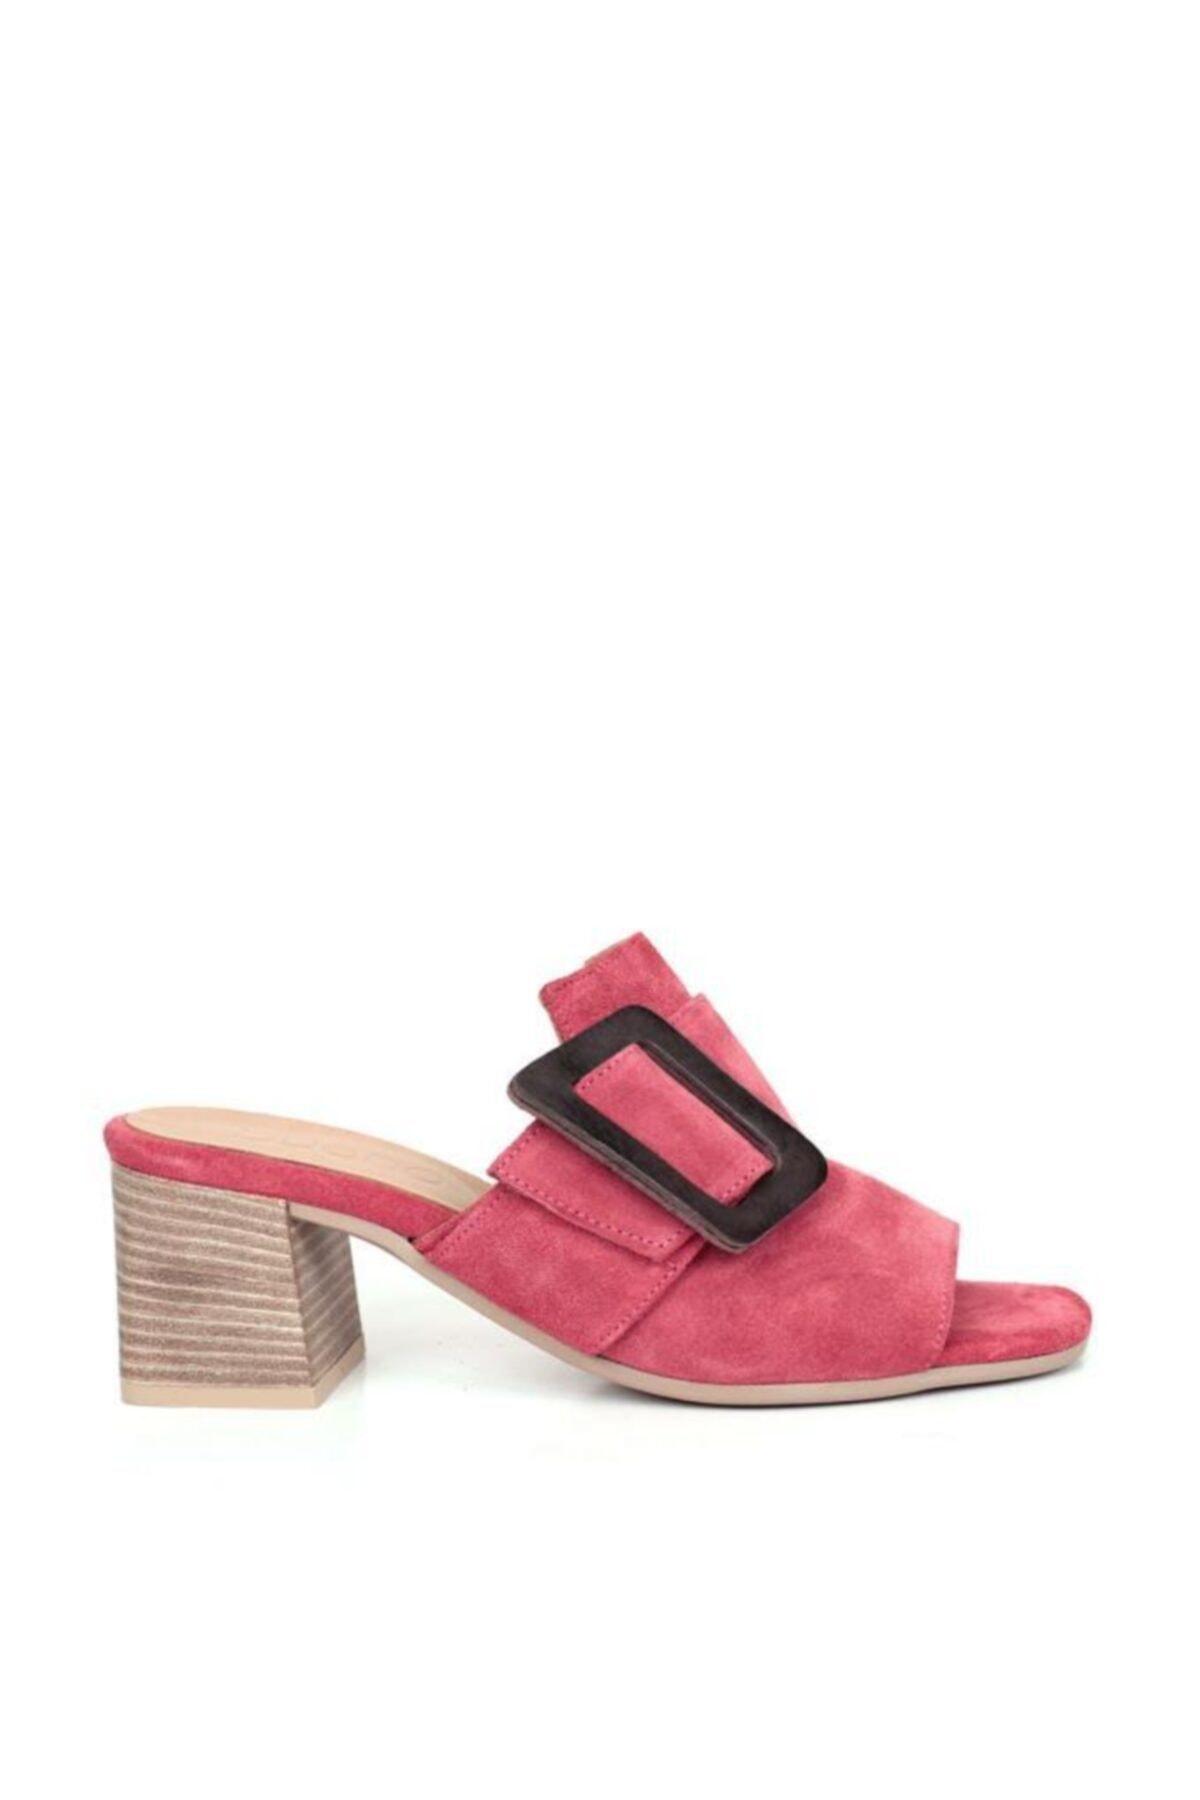 BUENO Shoes Toka Detaylı Hakiki Deri Topuklu Kadın Terlik 9n1317 1